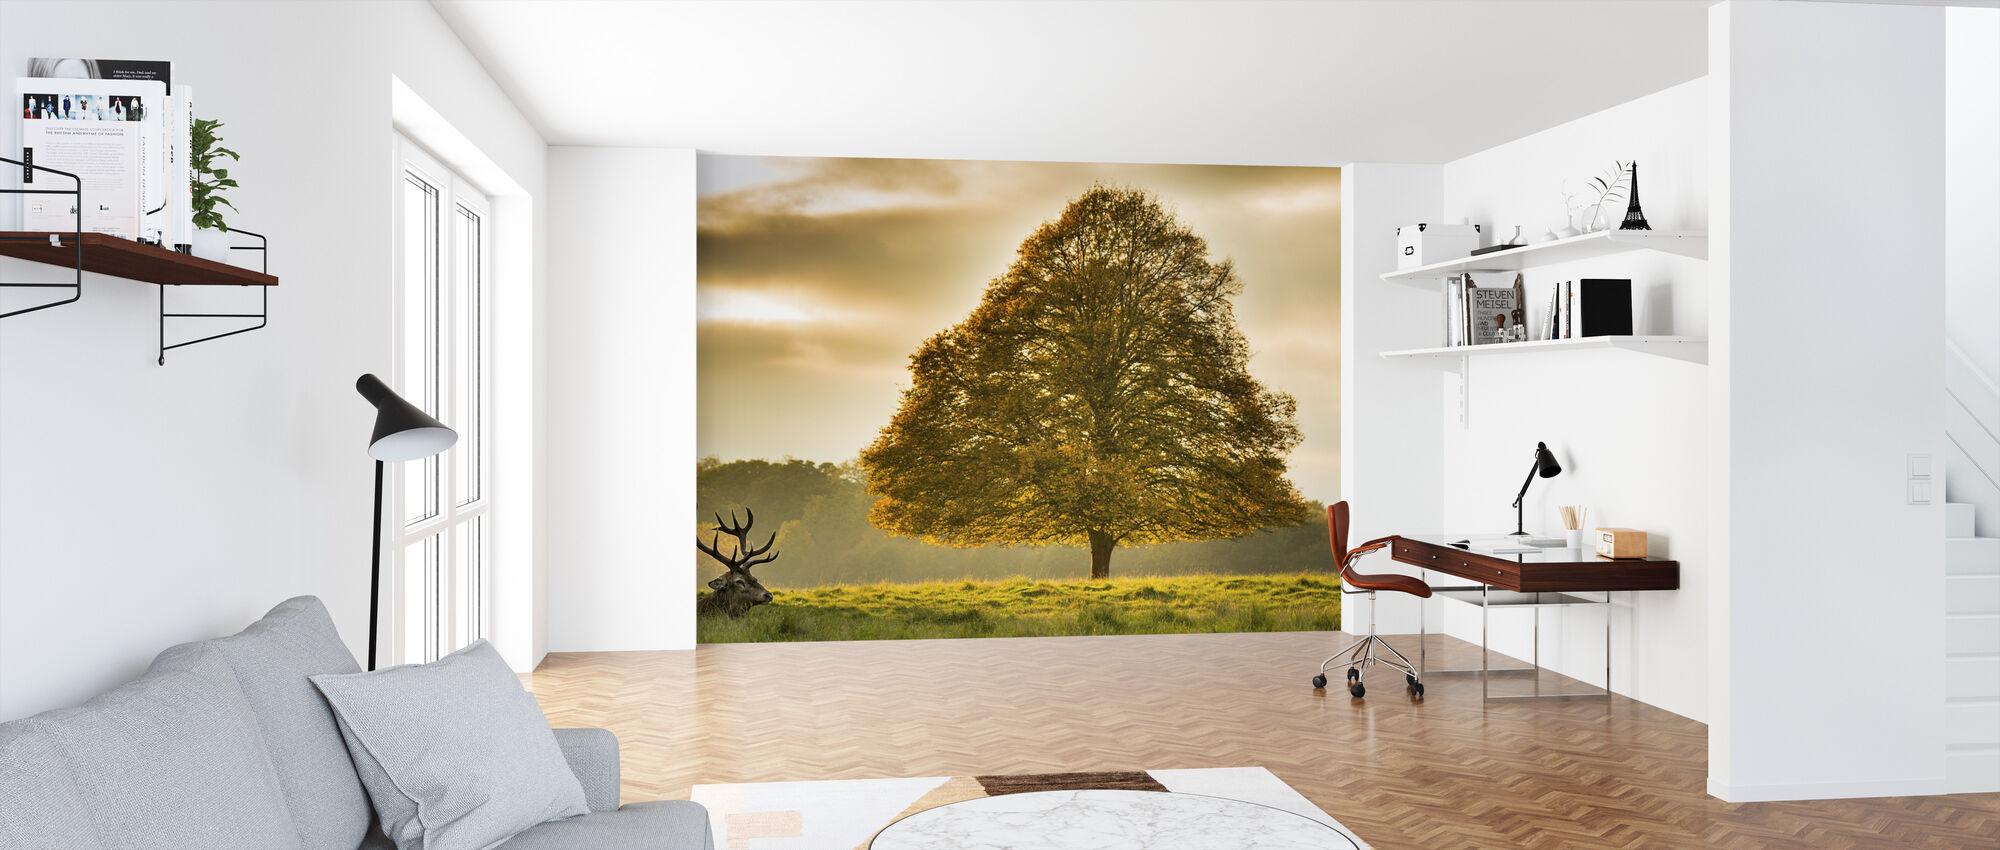 Hjorte og træet - Tapet - Kontor